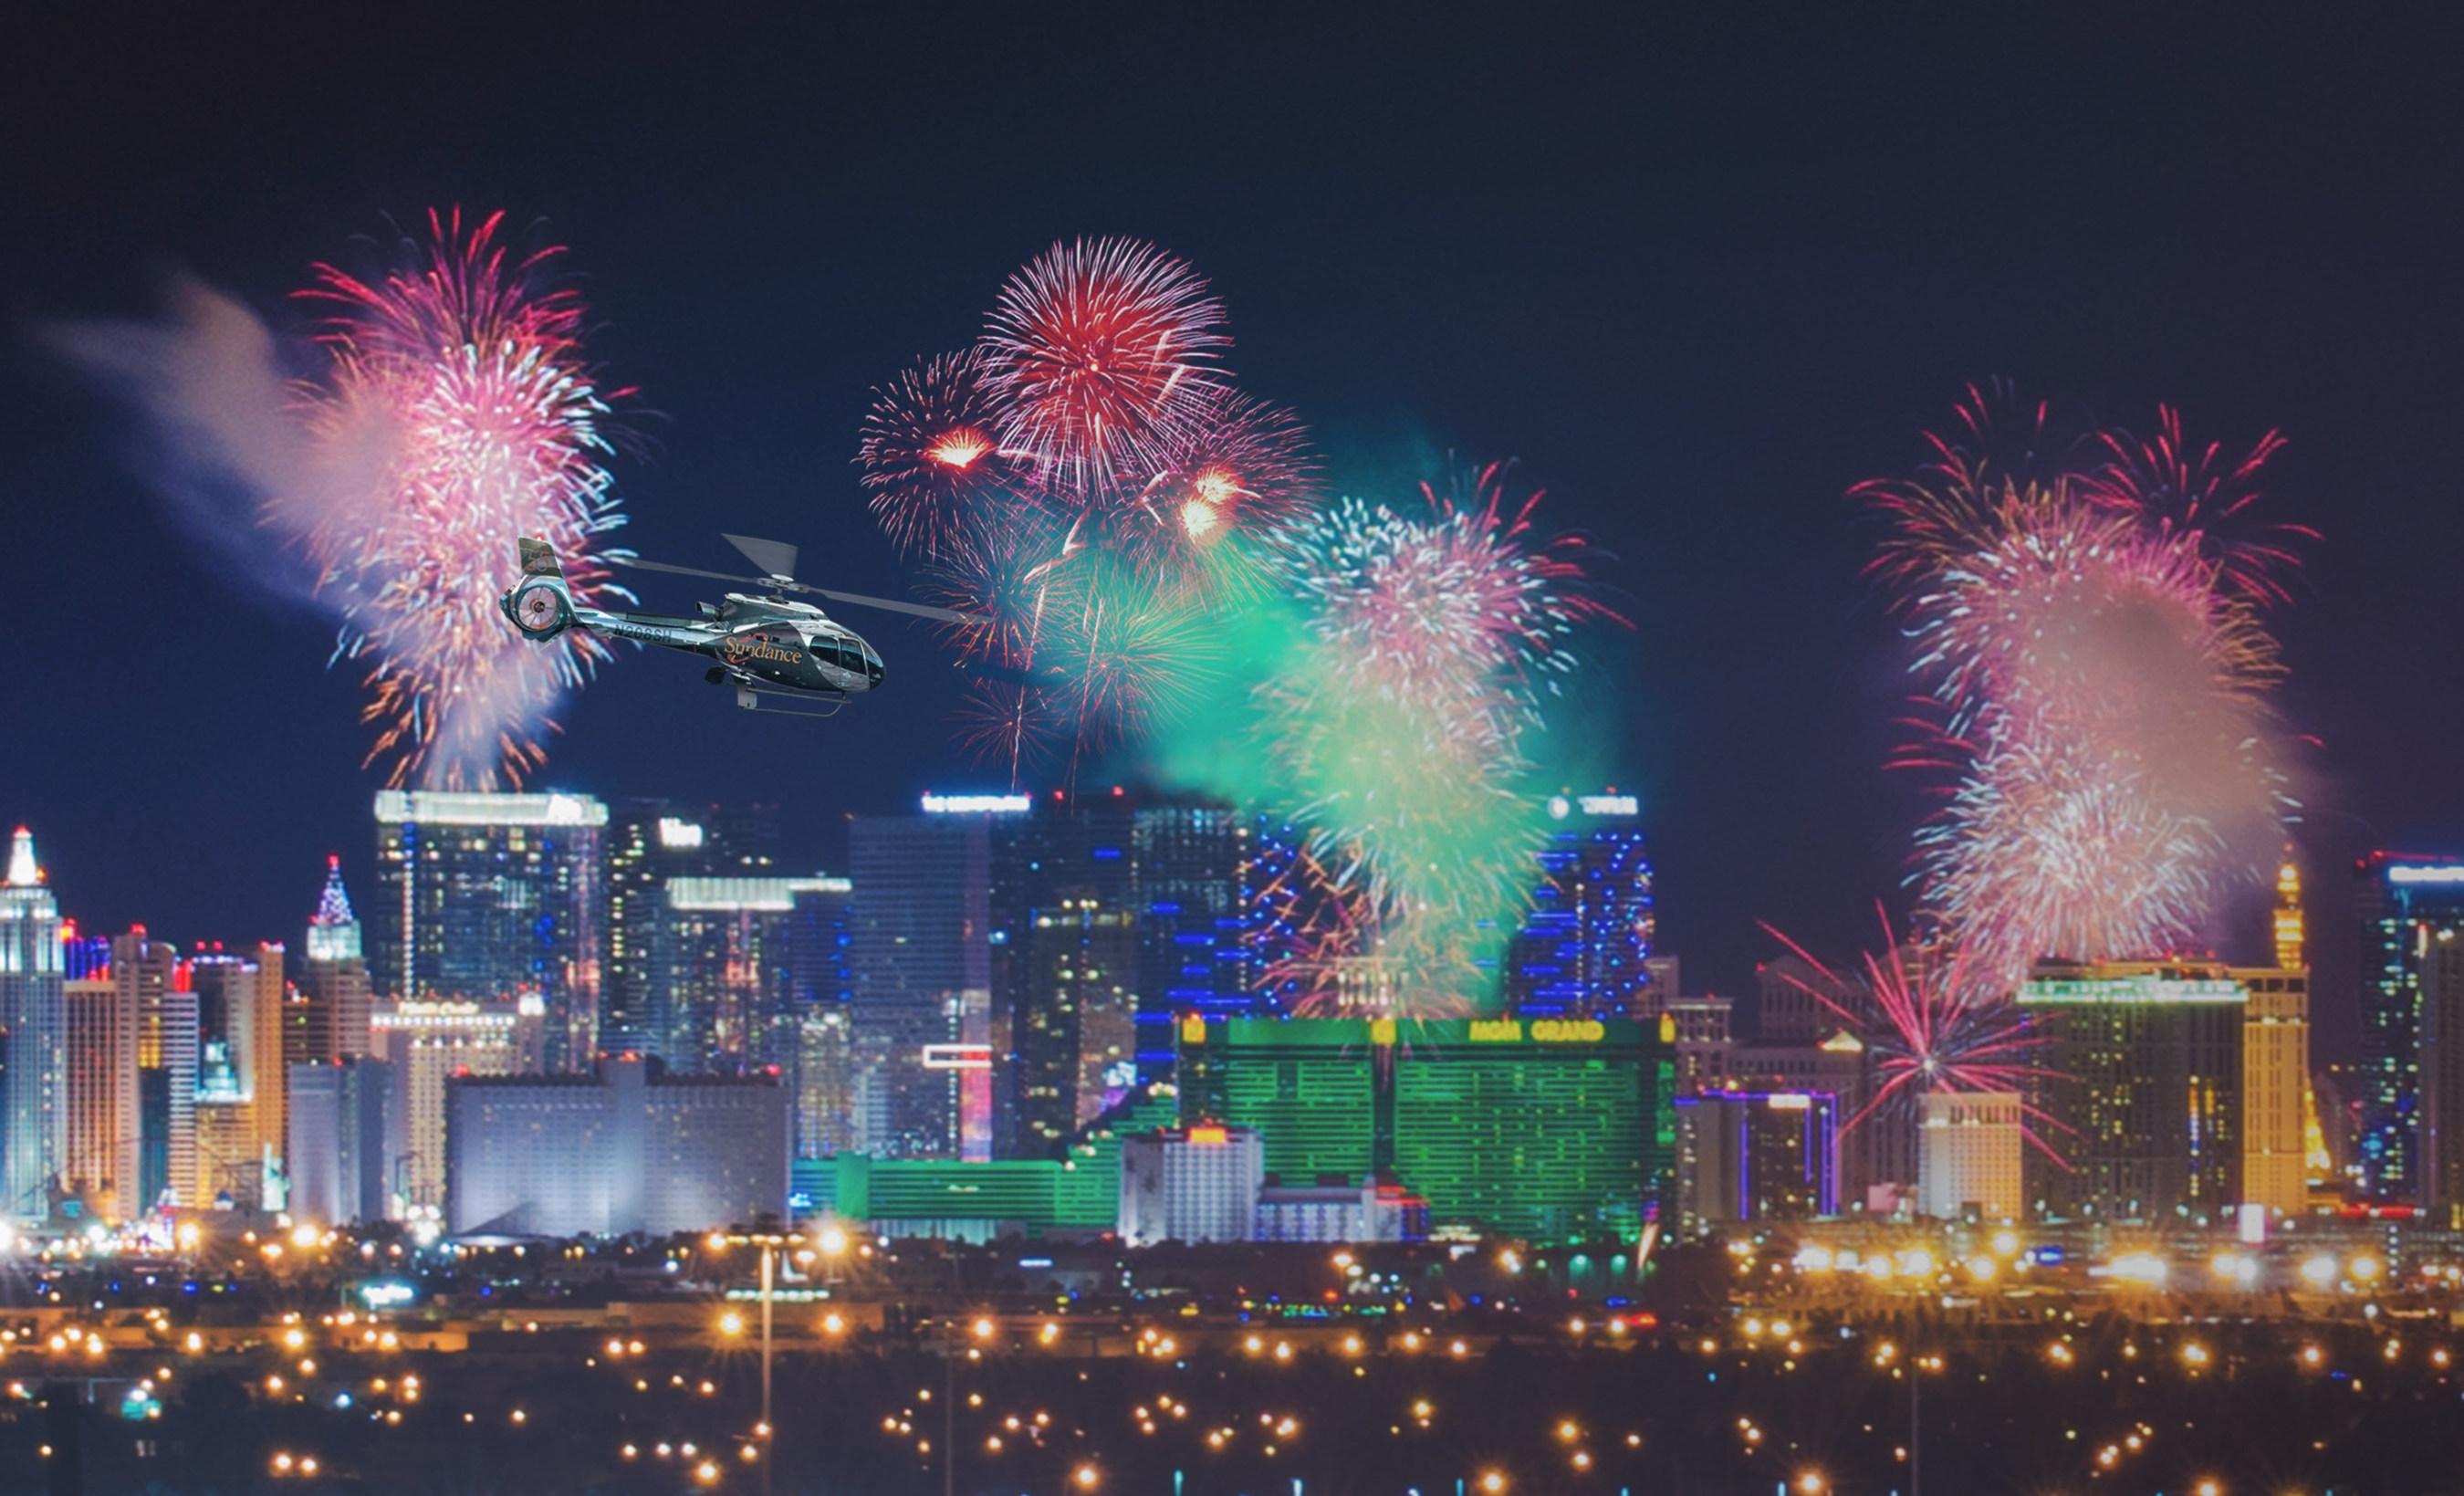 Kpop New Years Eve Show In Las Vegas Bznamb Newyear2020 Site